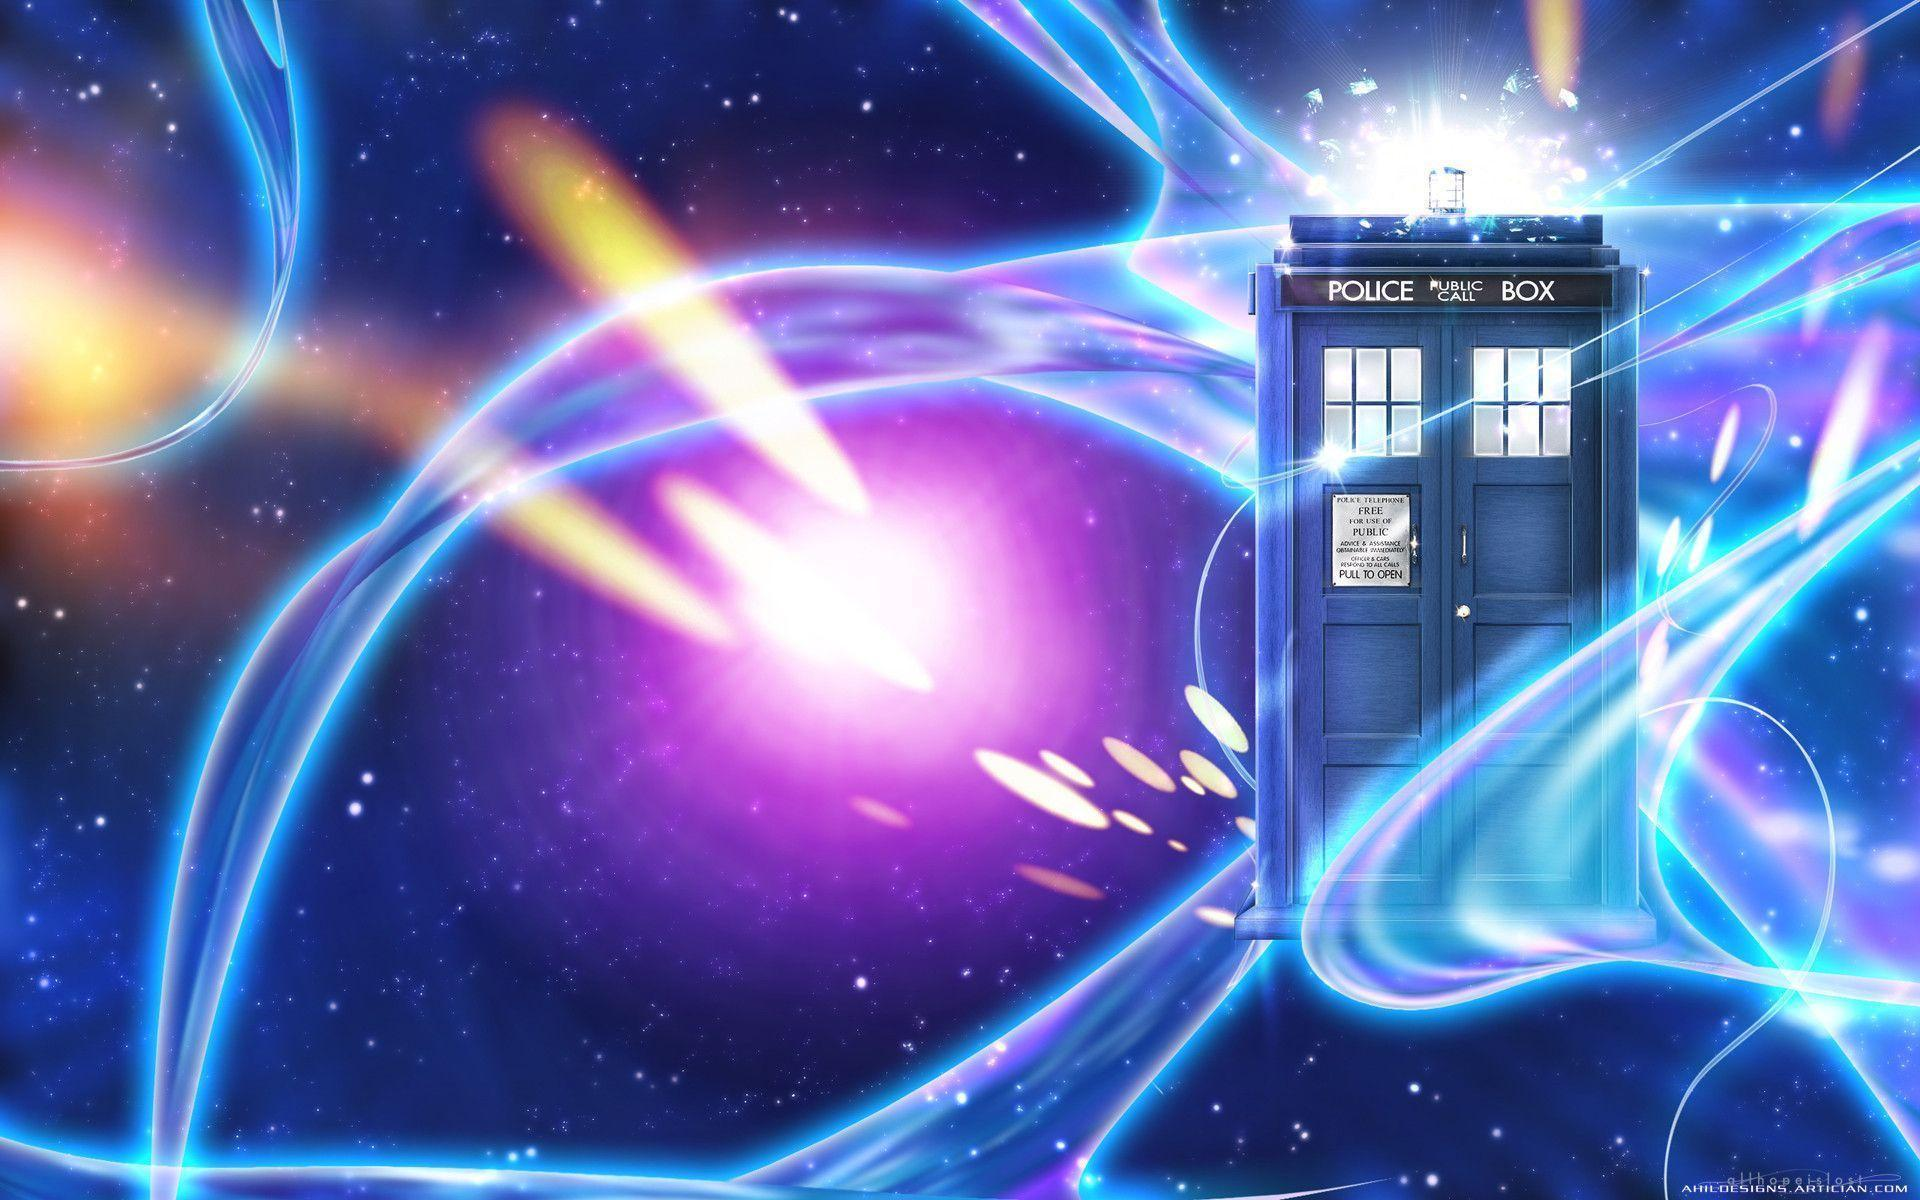 Download Wallpaper Mac Doctor Who - FjODTM4  Gallery_794923.jpg